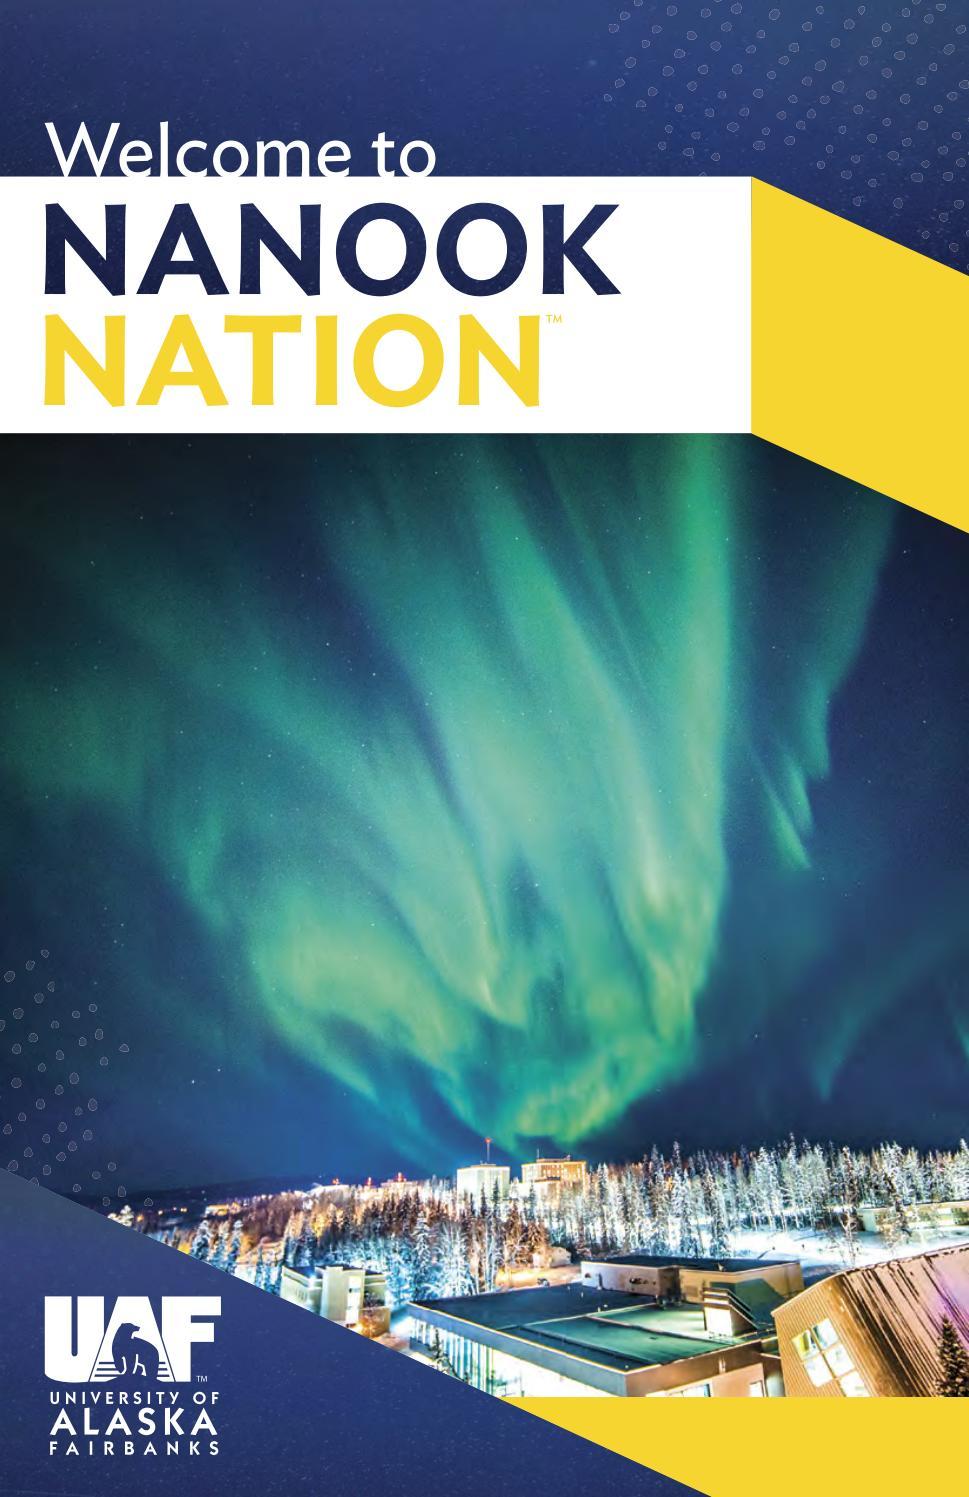 UAF 2019 Search Piece by University of Alaska Fairbanks - issuu